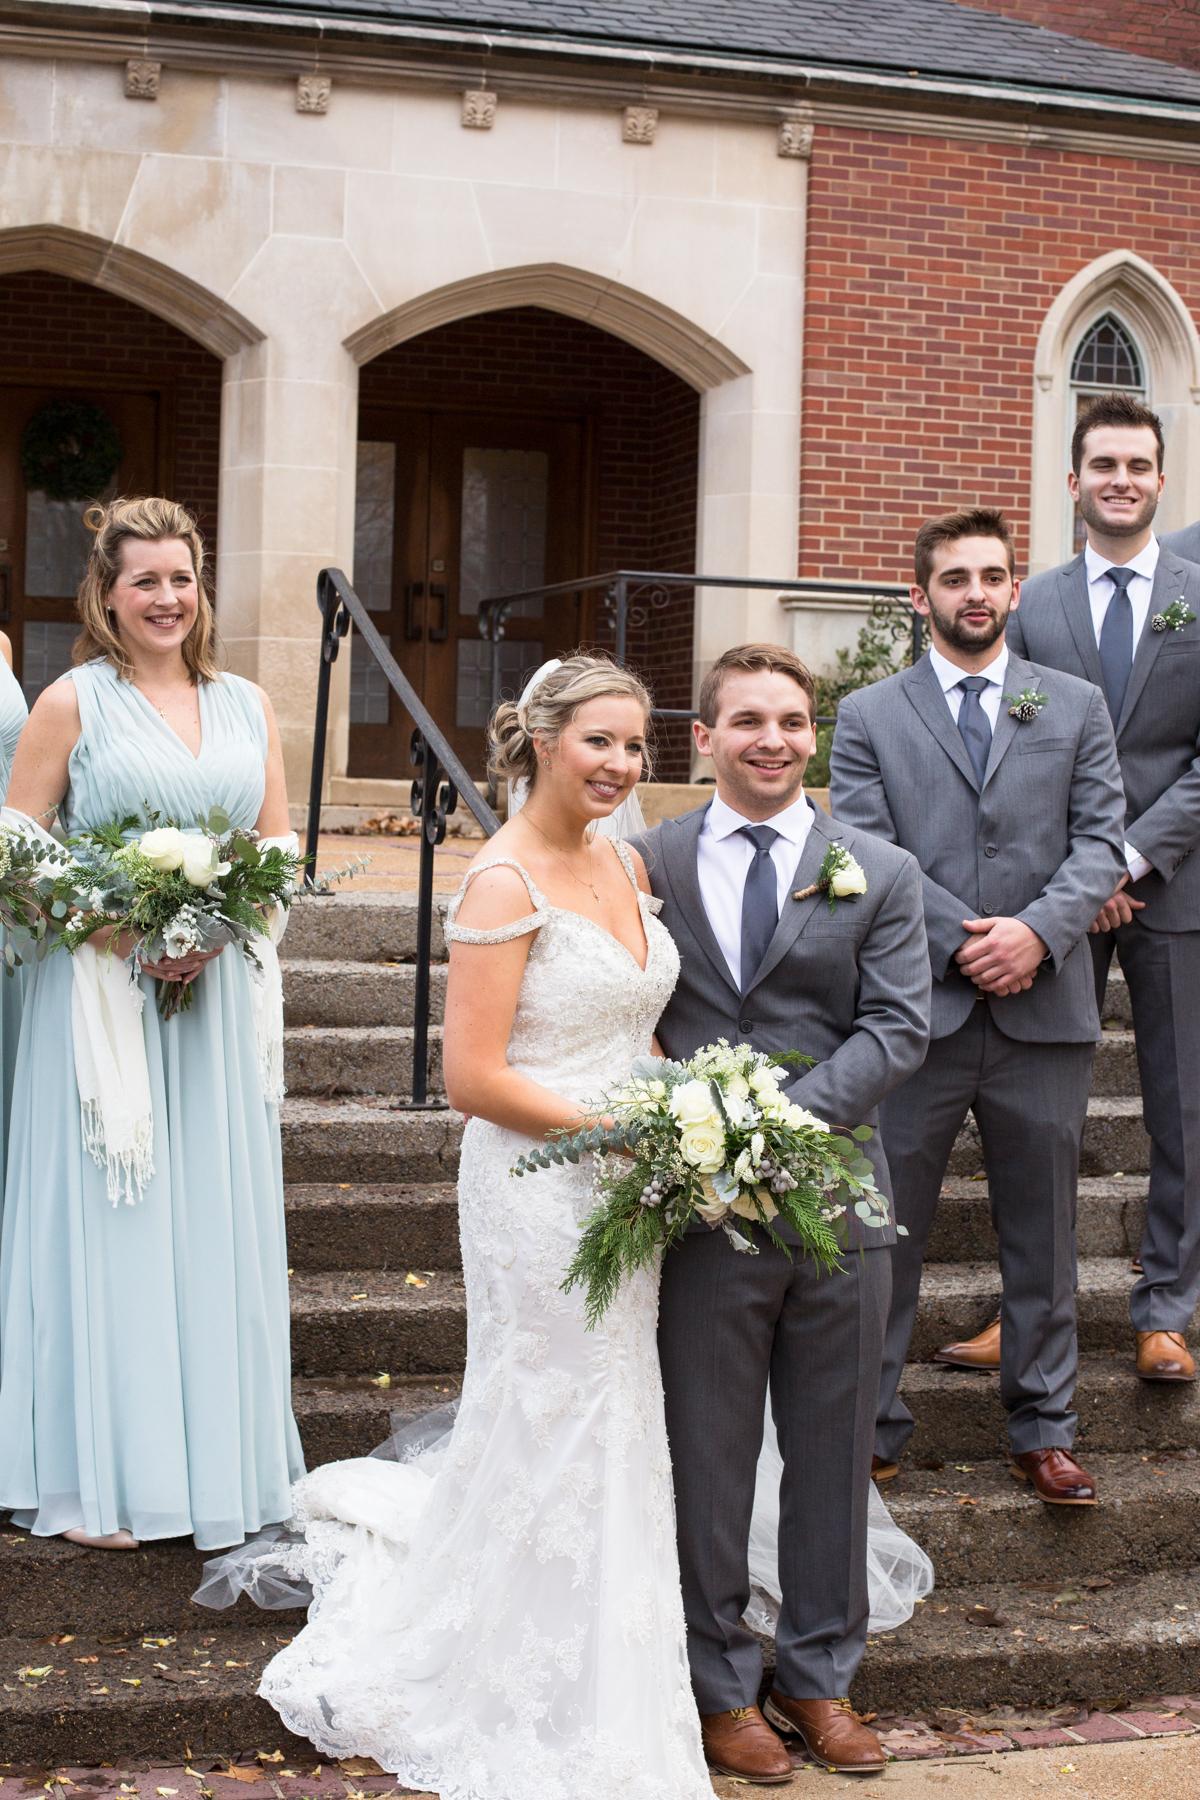 Kelli-and-Matt-Nashville-Wedding-Sneak-Peak-0145.jpg